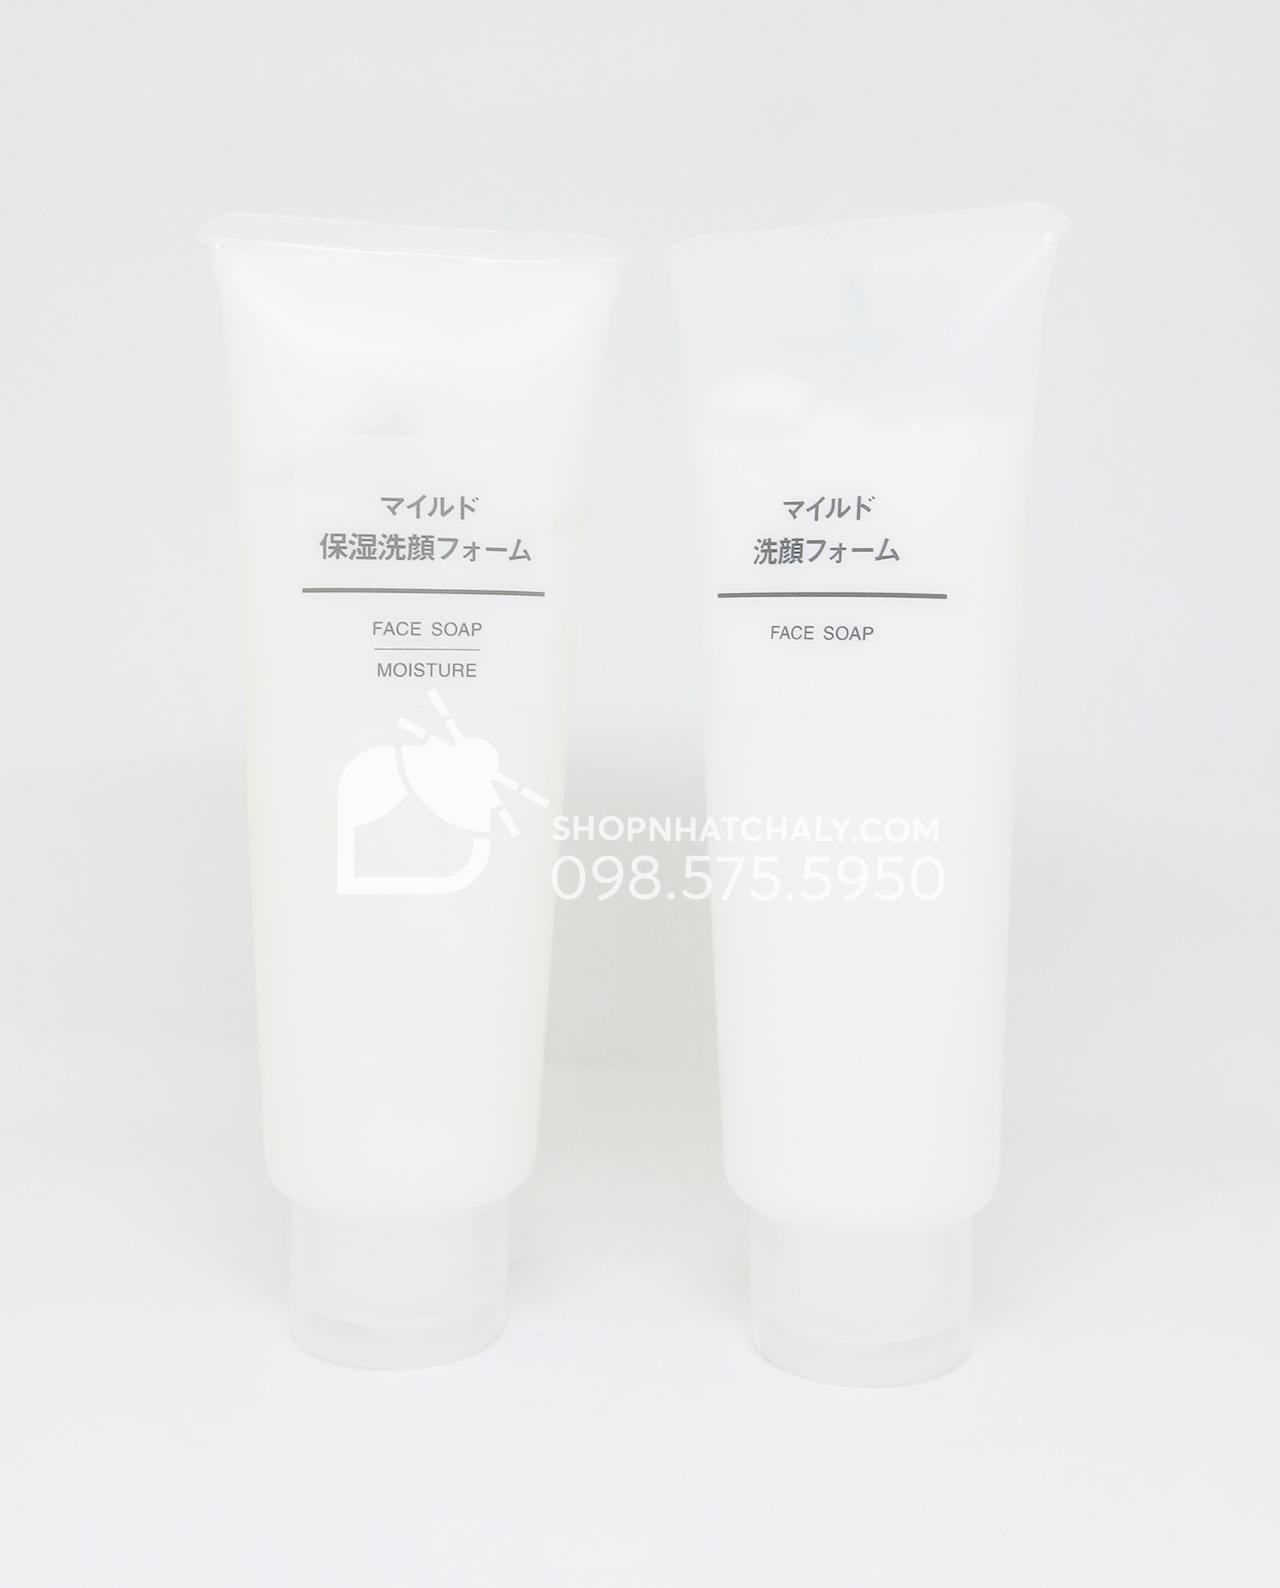 Sữa rửa mặt Muji Face Soap của Nhật Bản 120g